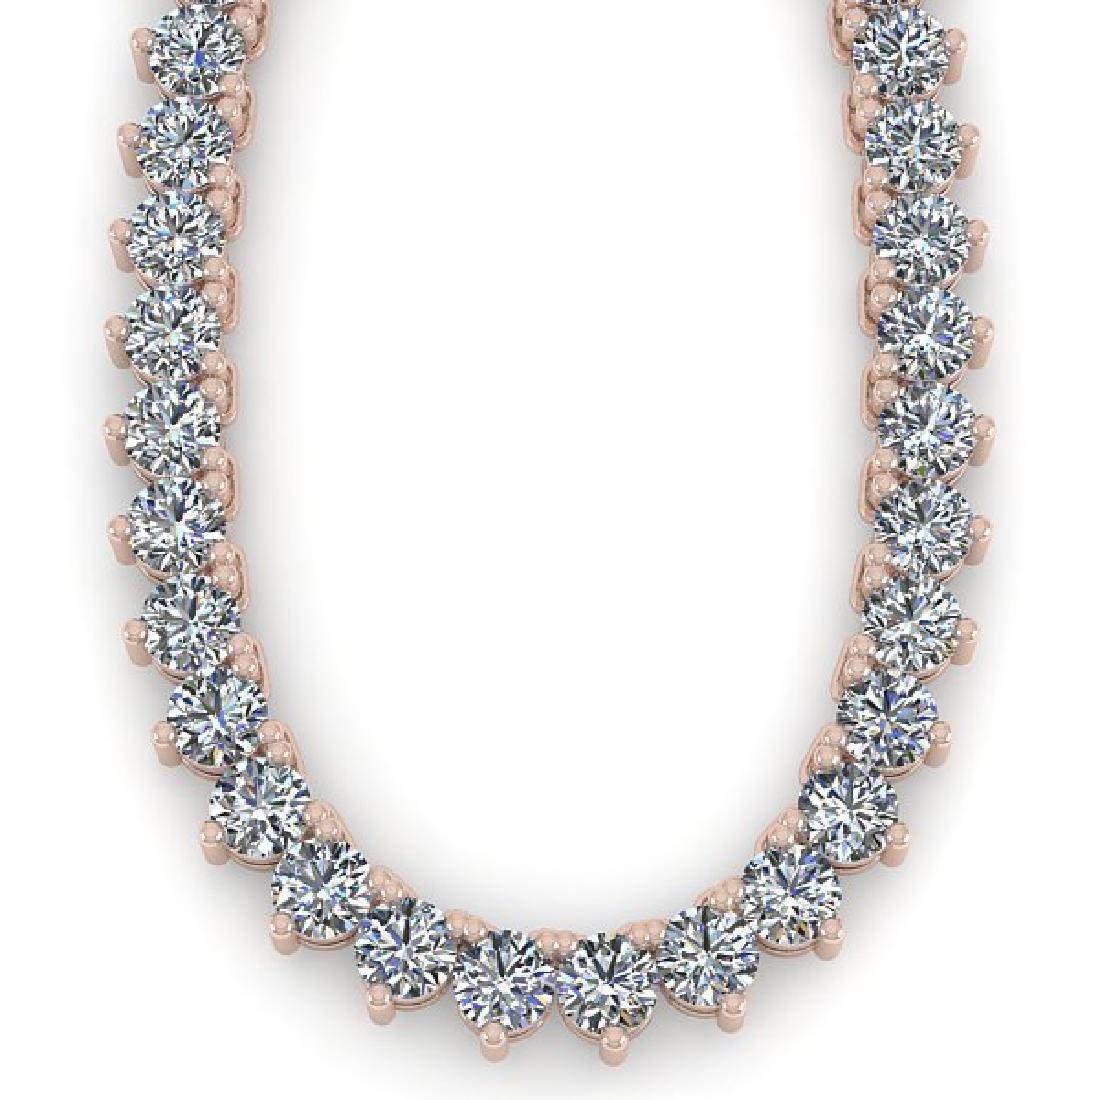 15 CTW Solitaire VS/SI Diamond Necklace 14K Rose Gold - 2